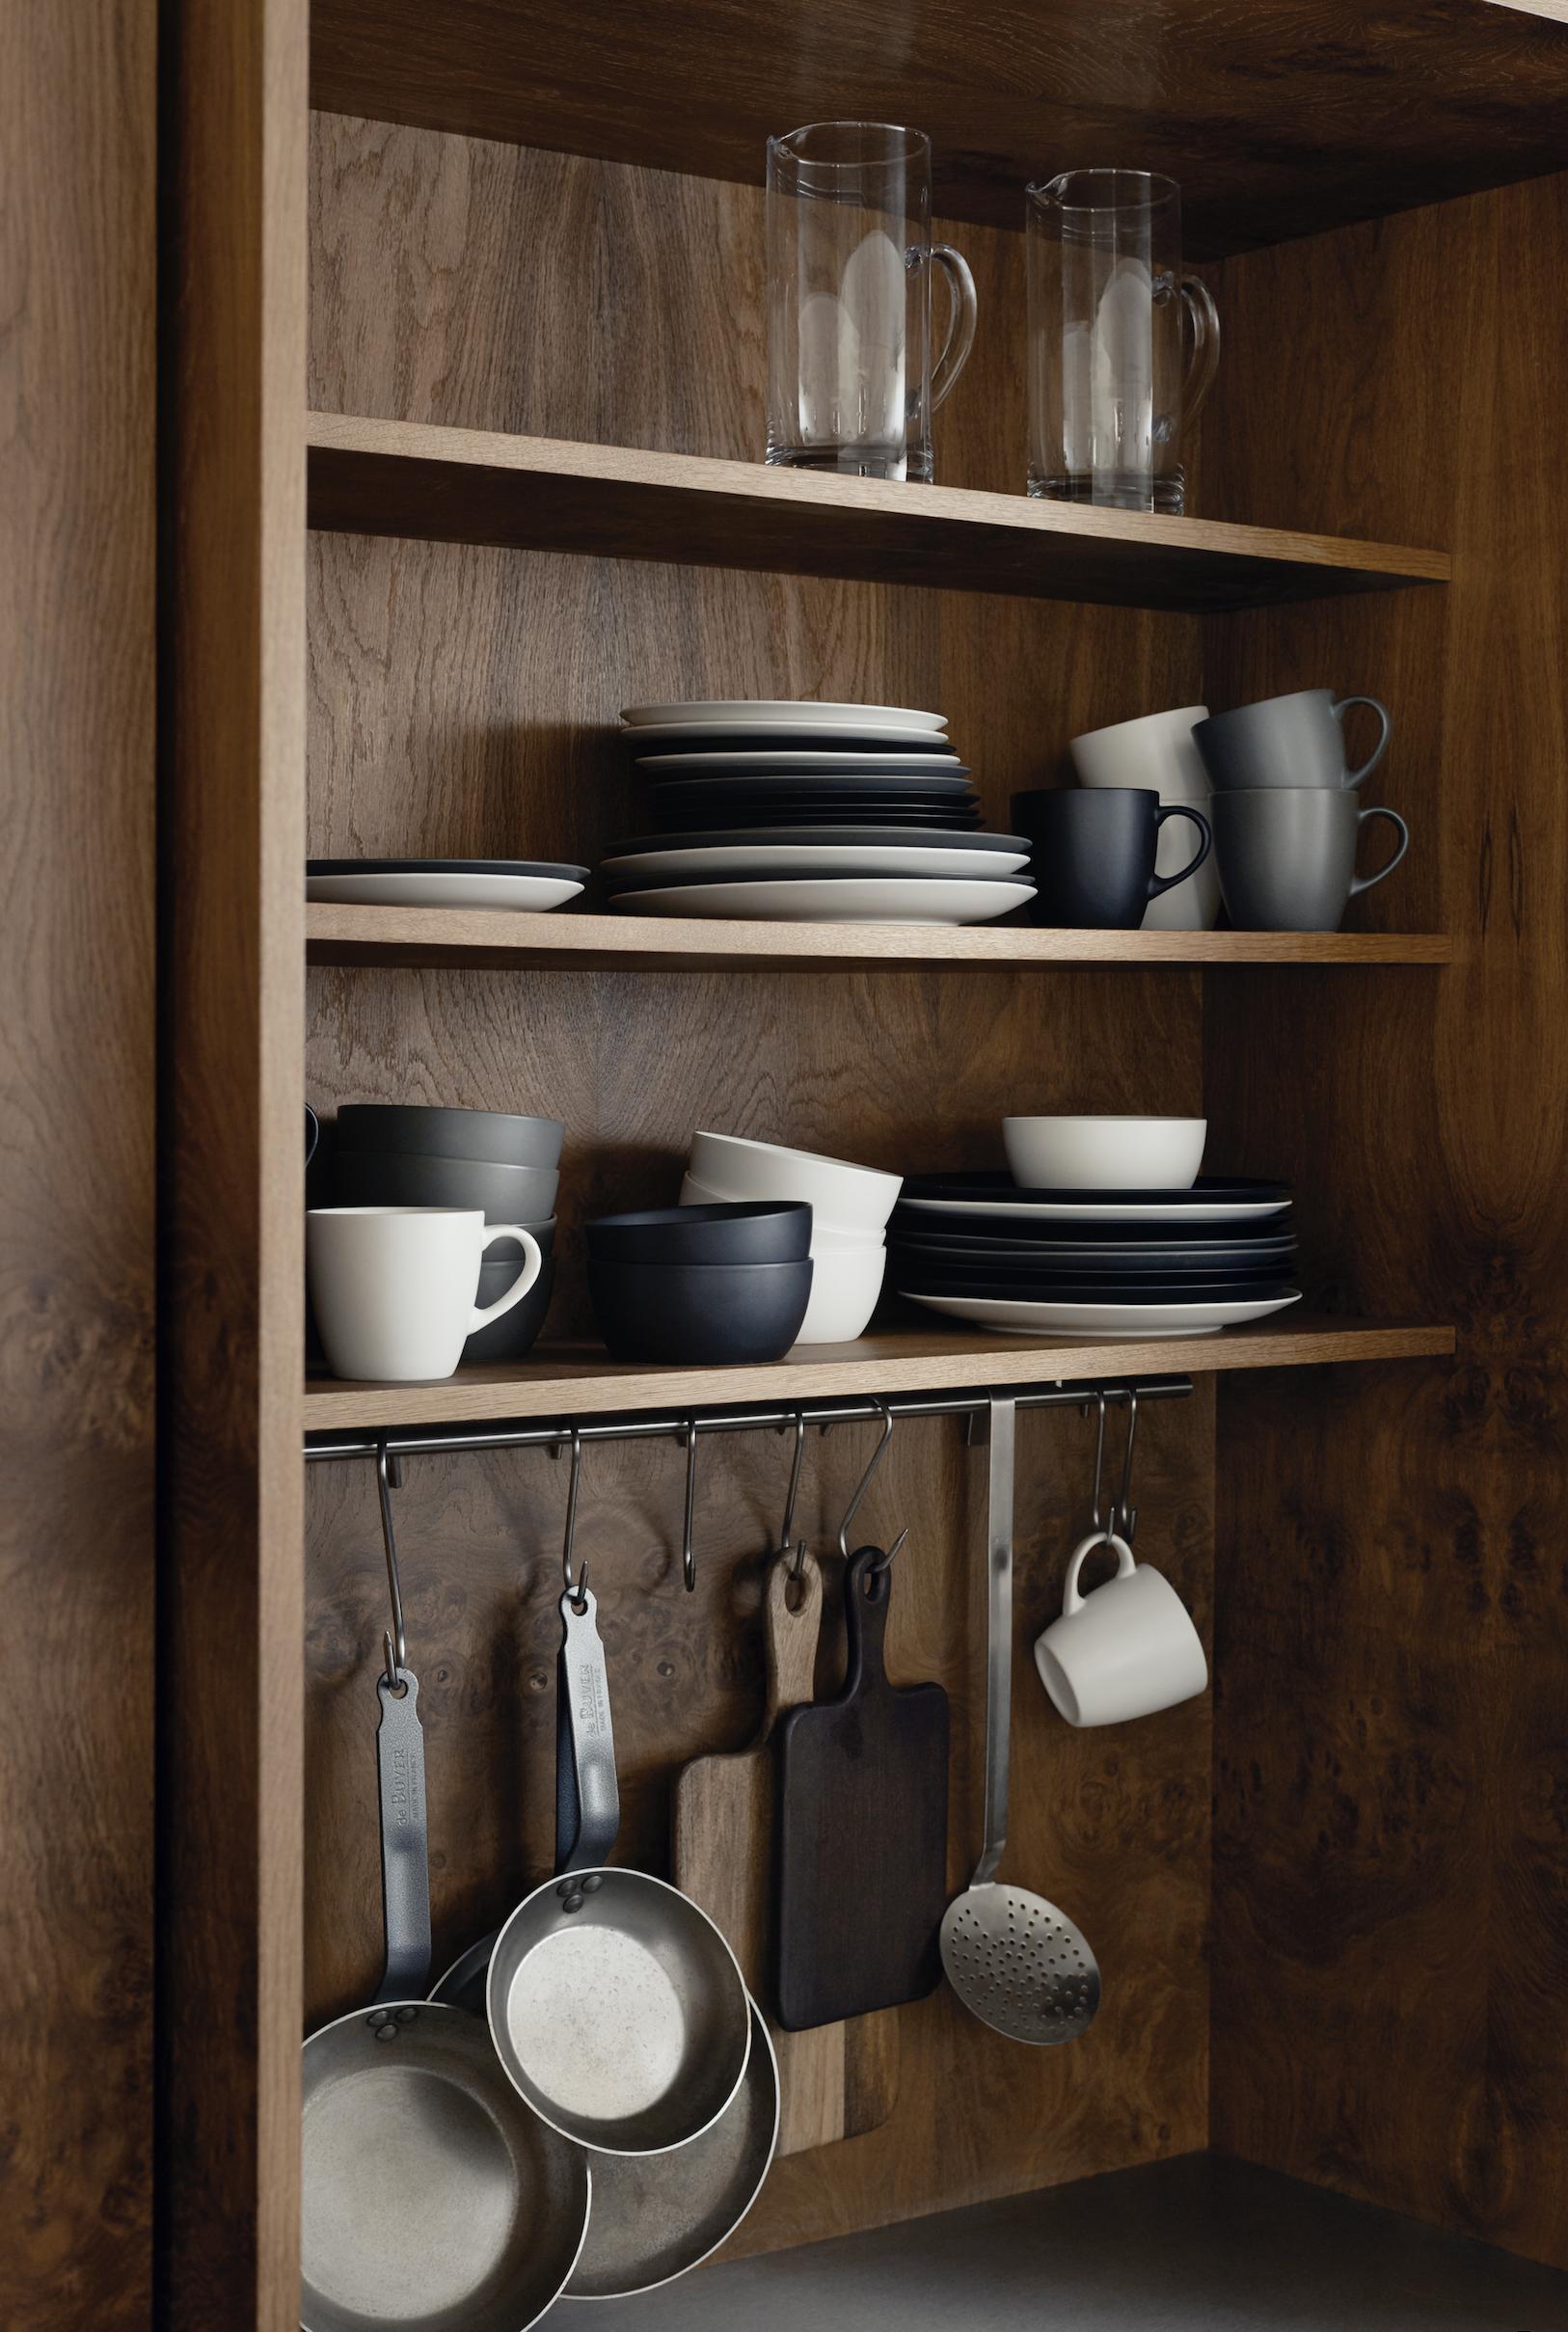 Küche ideen platz raum skärmklipp    details  pinterest  küchen ideen